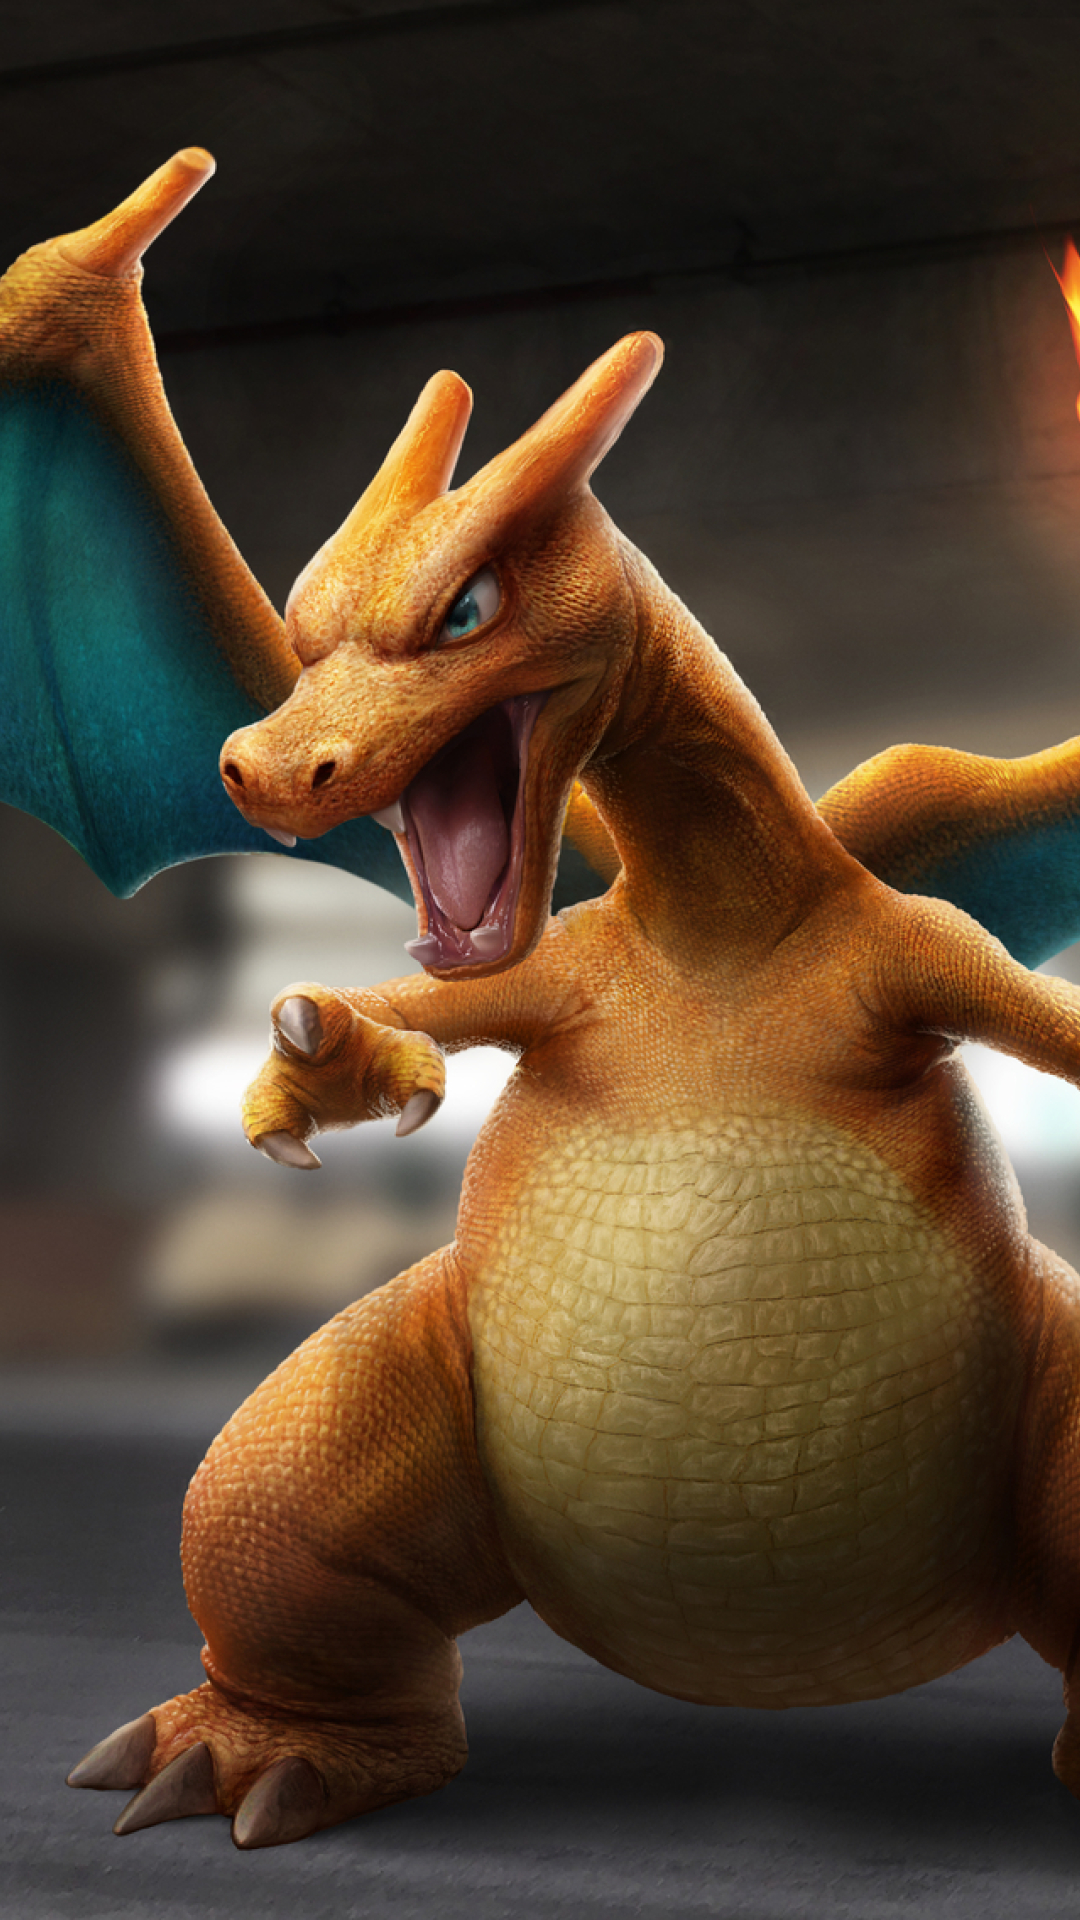 1080x1920 Charizard Pokemon Iphone 7, 6s, 6 Plus and Pixel ...